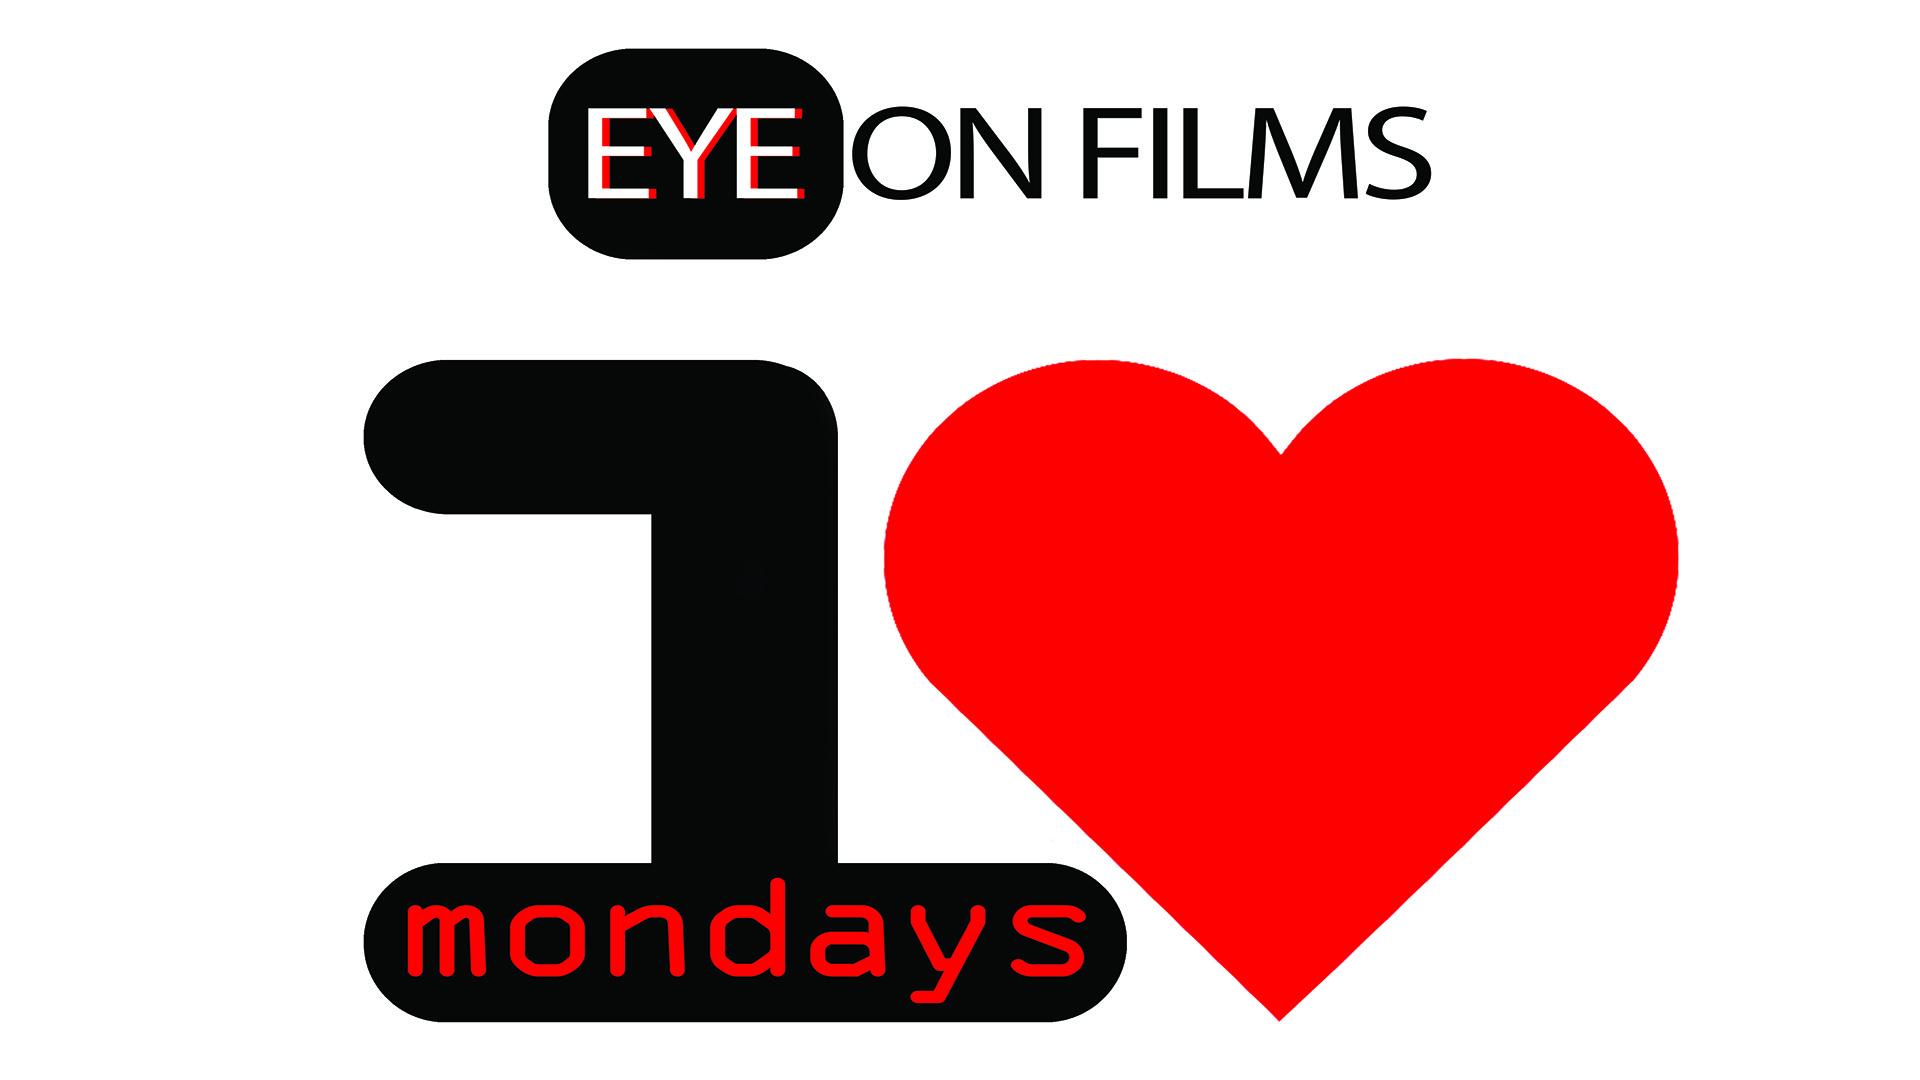 Eye on films, i love mondays!